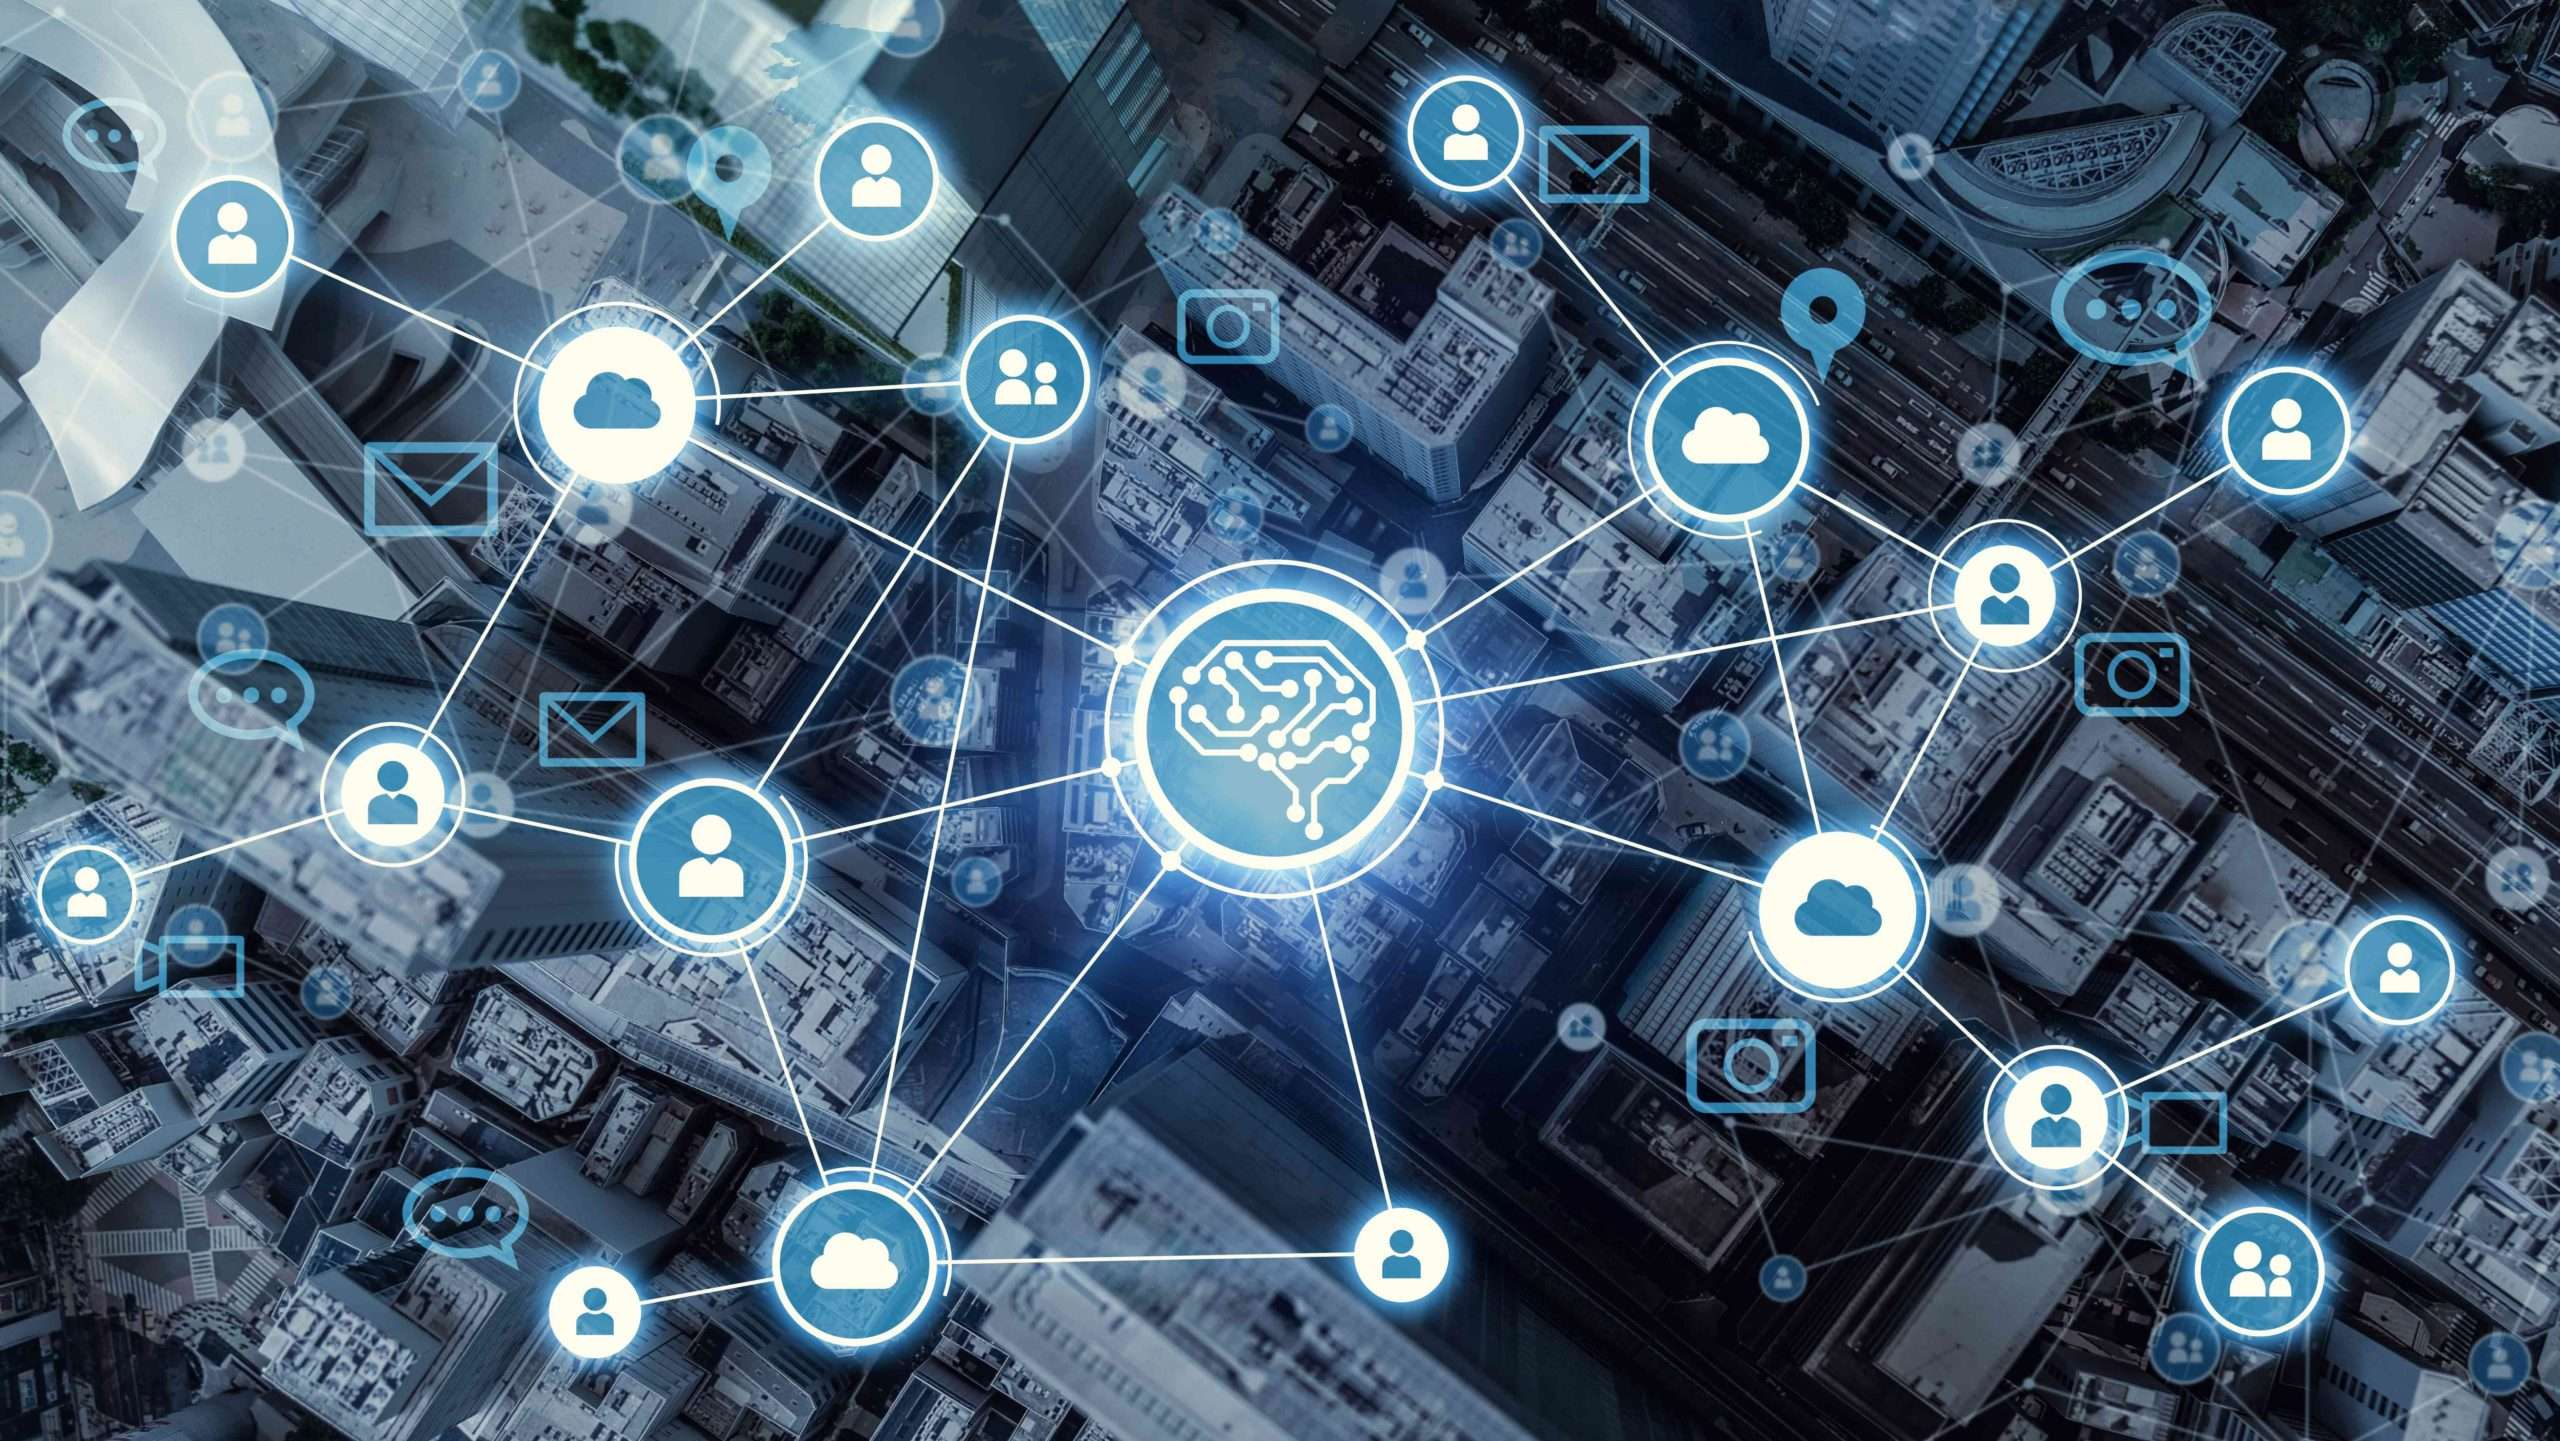 AI-artificialintelligence-blog-image